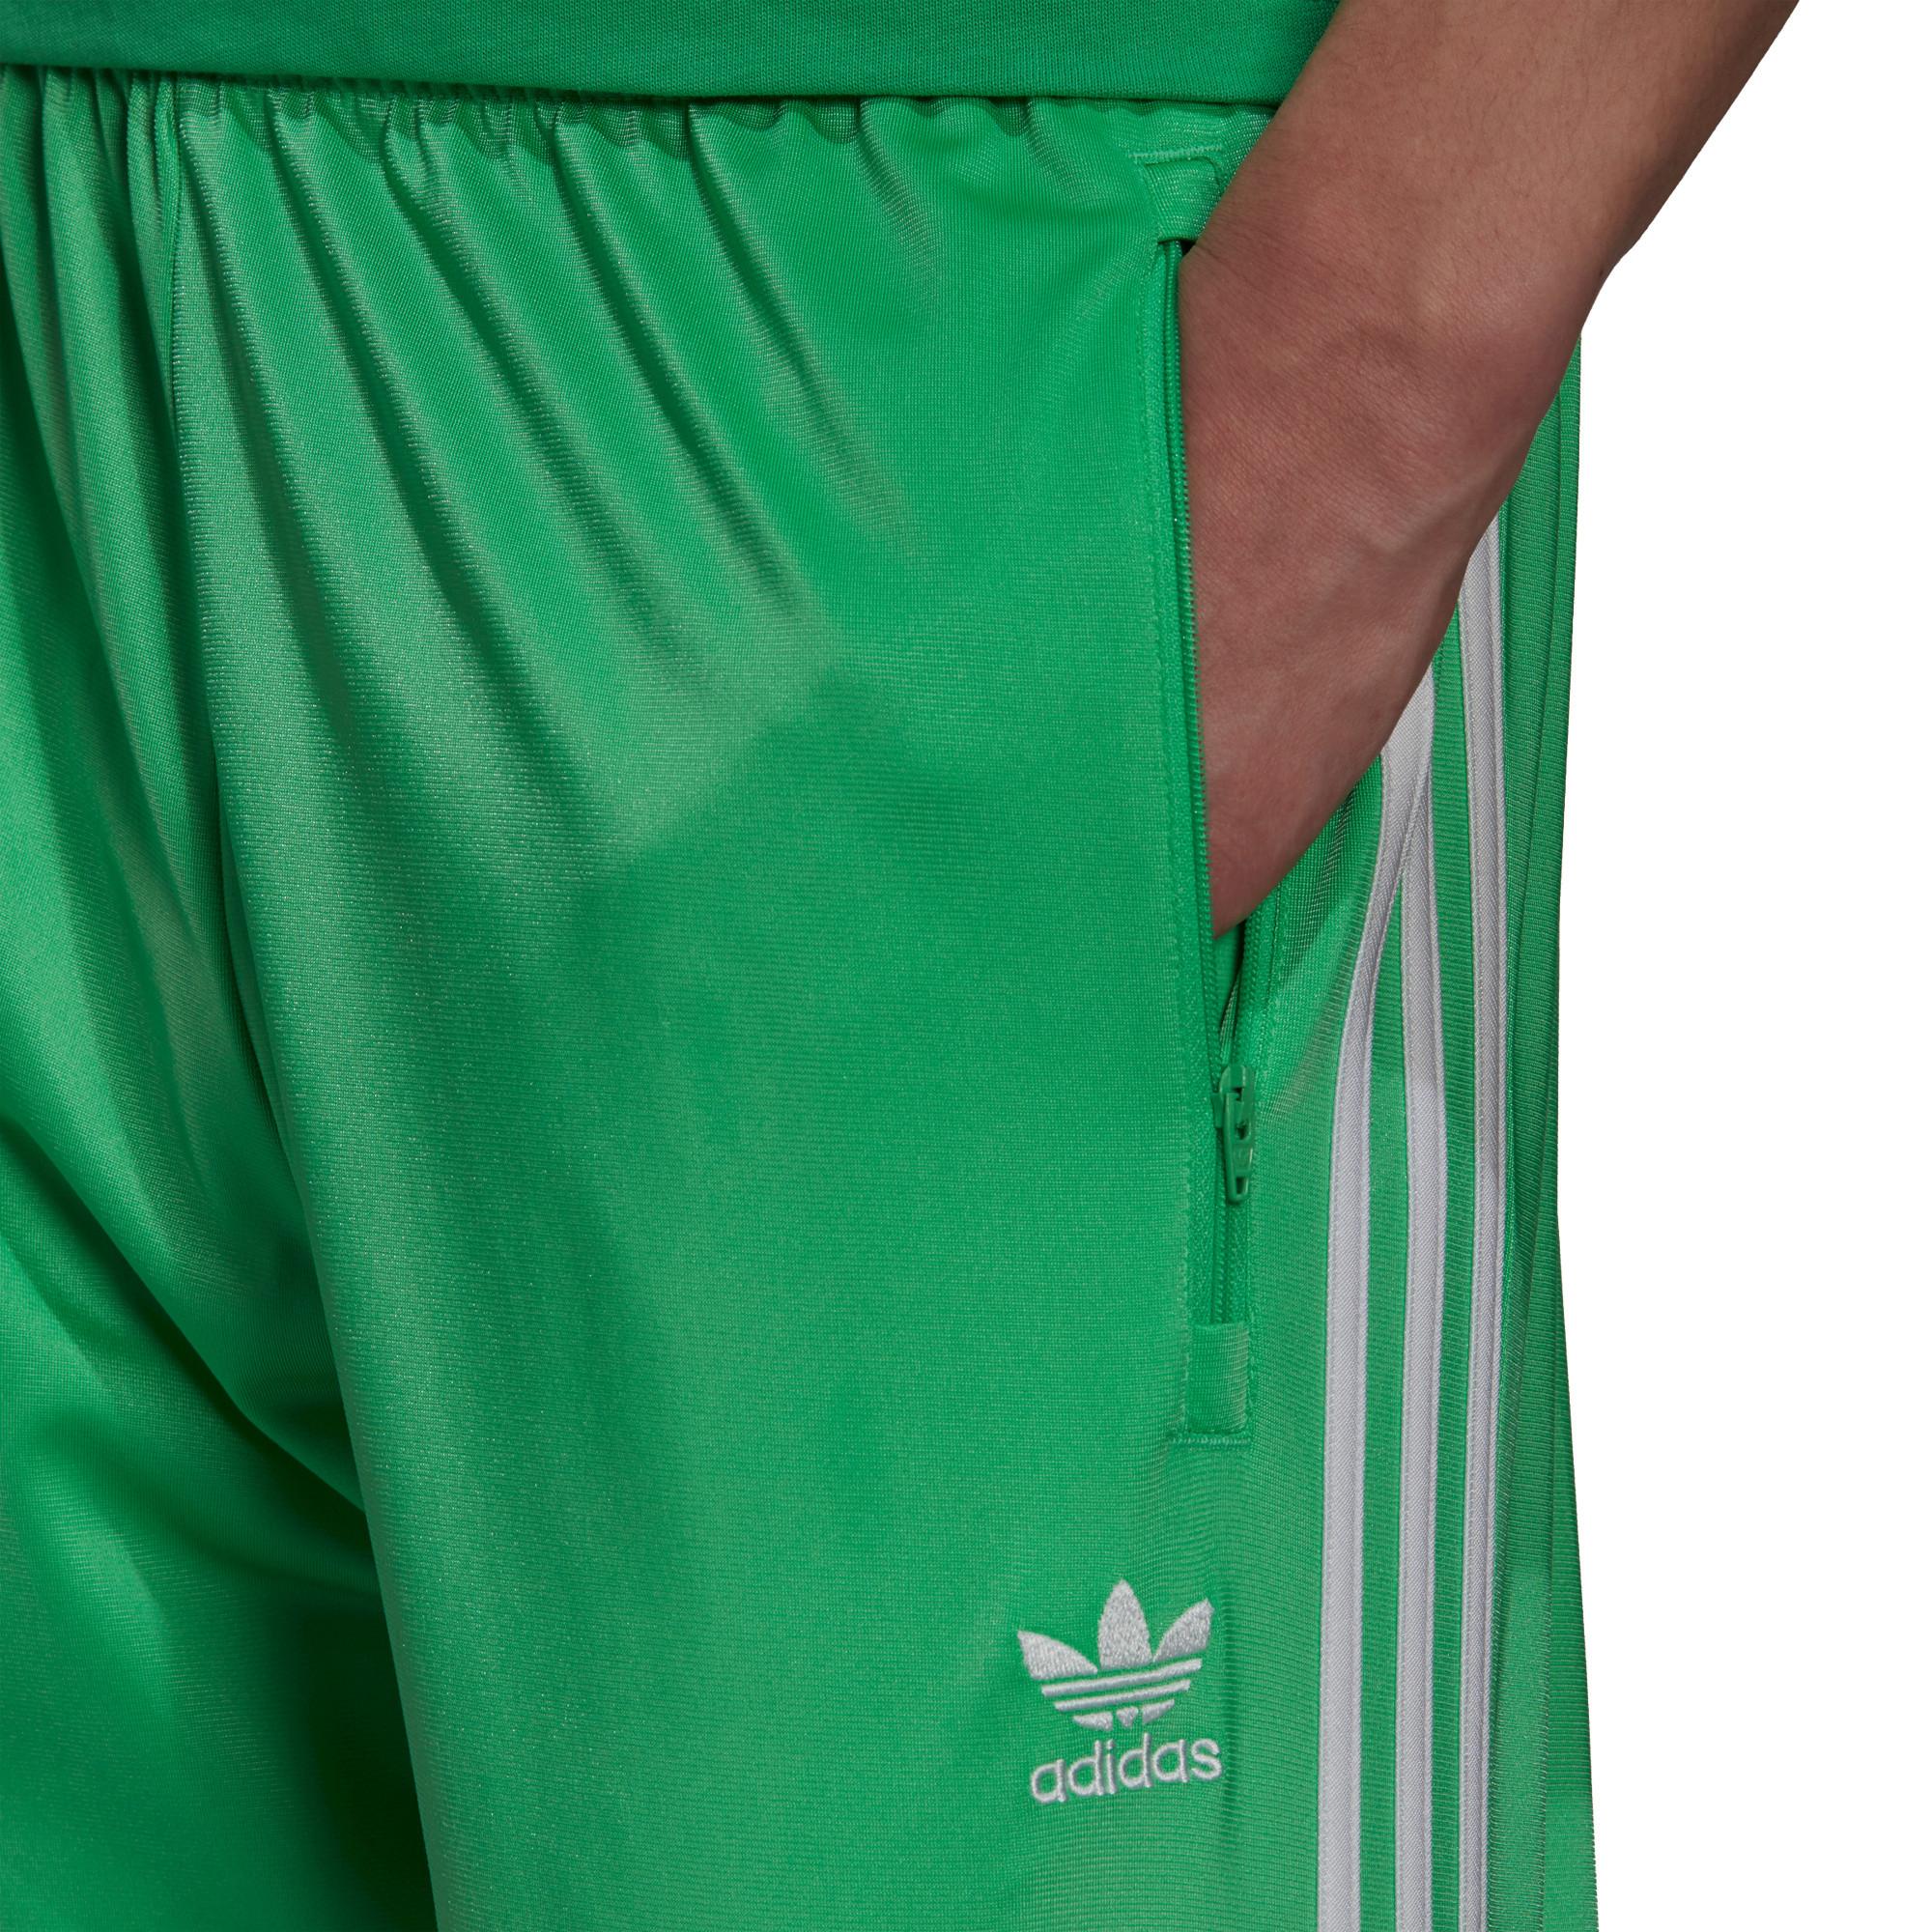 Pantaloni tuta uomo adicolor Classics Firebird Primeblue, Verde, large image number 3